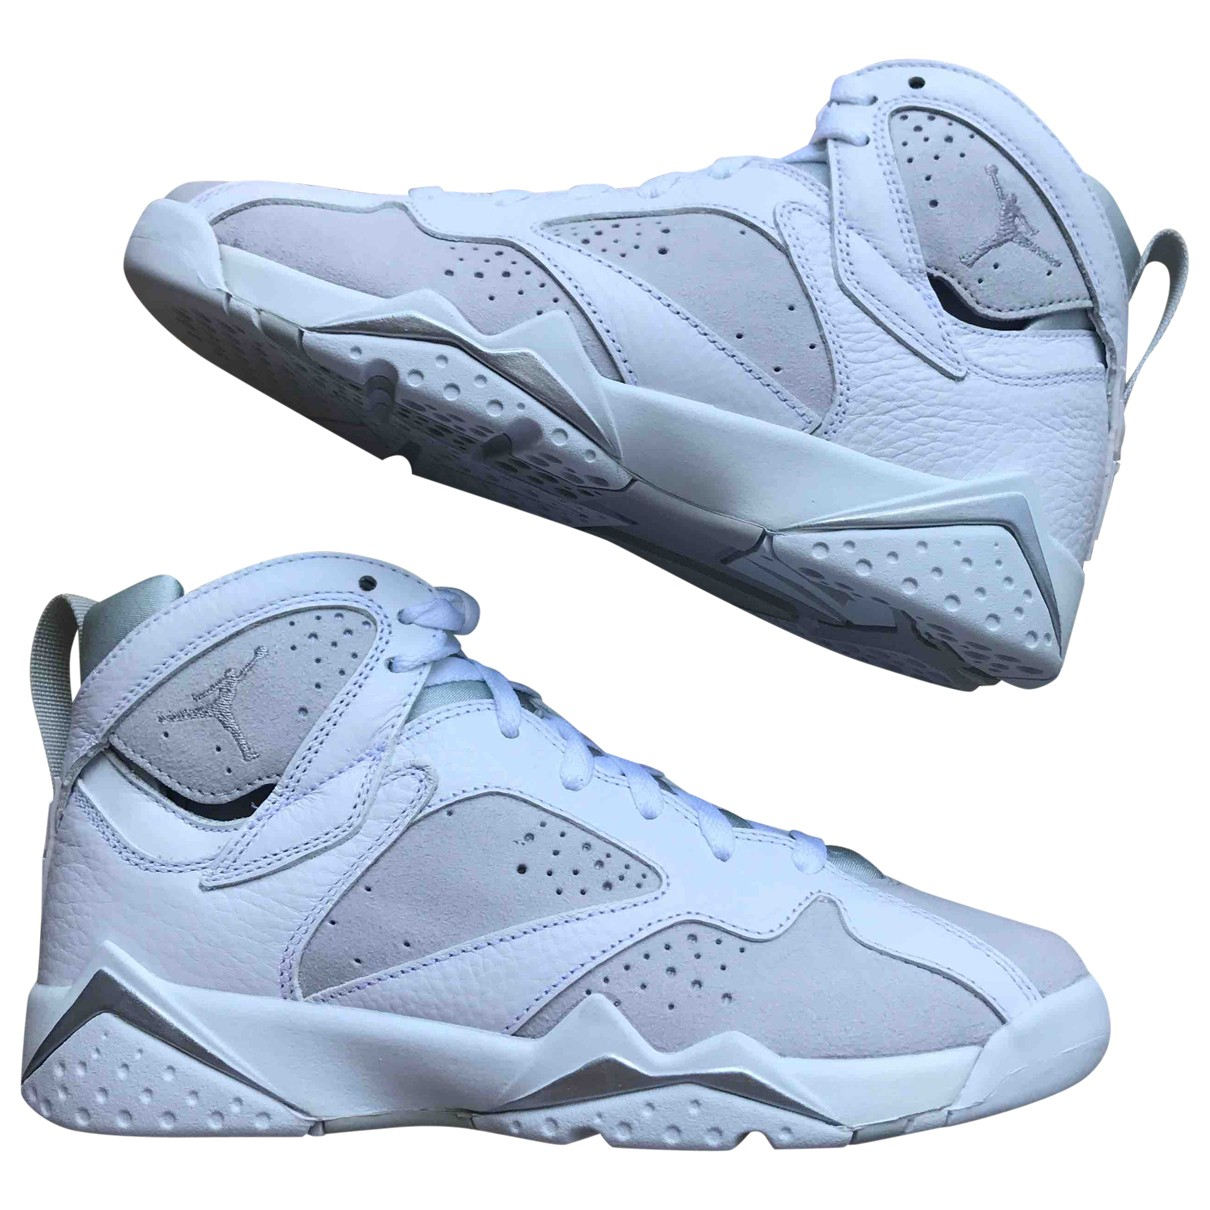 Jordan - Baskets Air Jordan 7 pour enfant en cuir - blanc